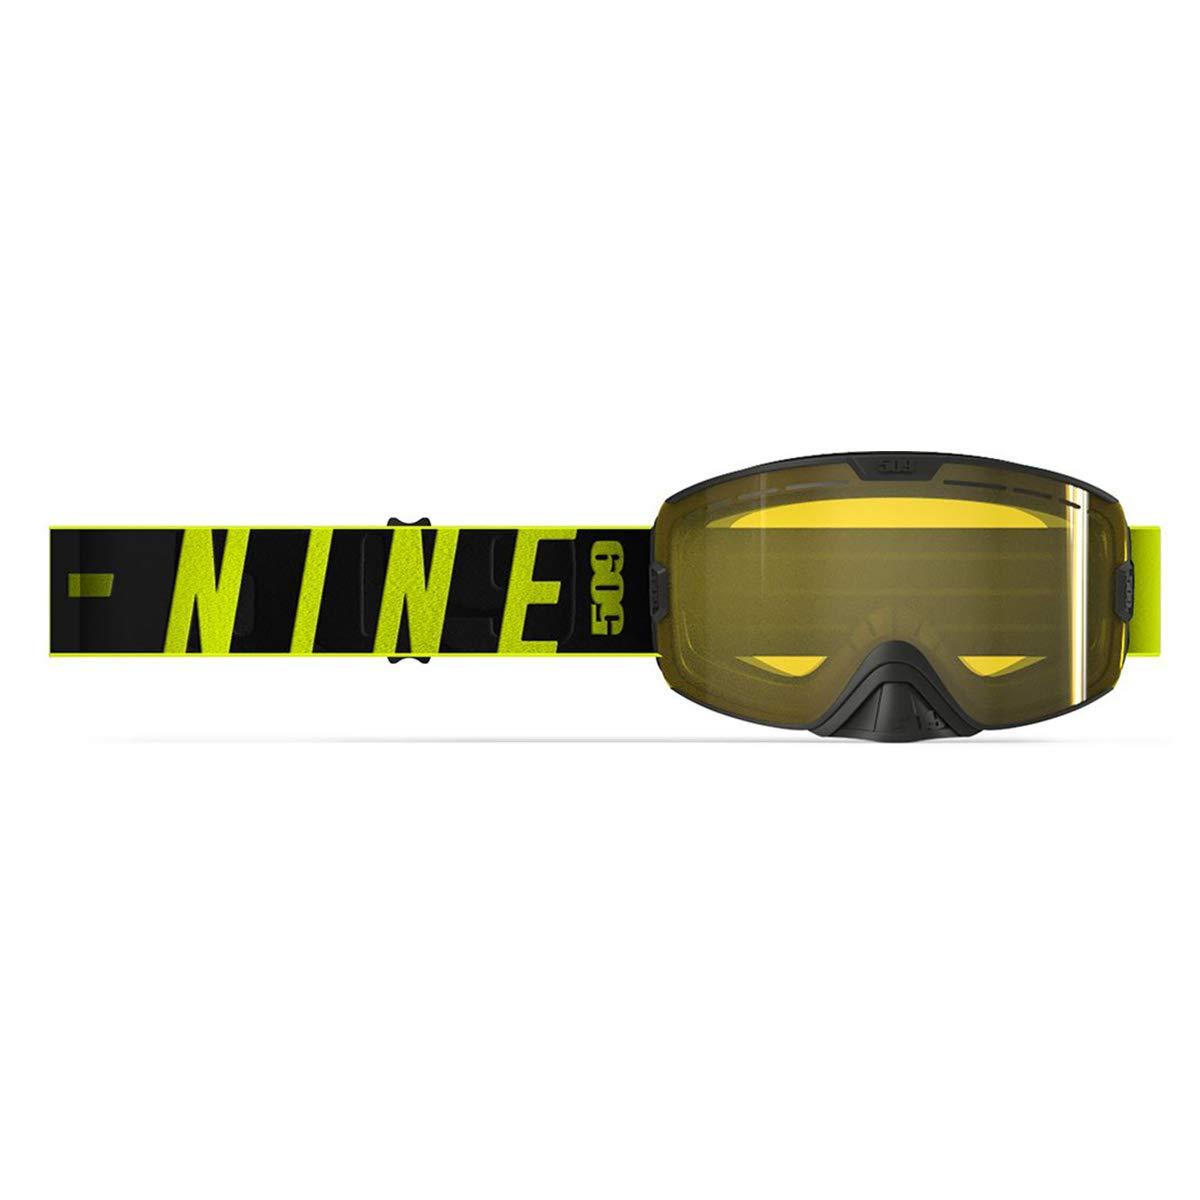 509 Kingpin Ignite Goggle (Black/Hi-Vis) by 509 (Image #1)